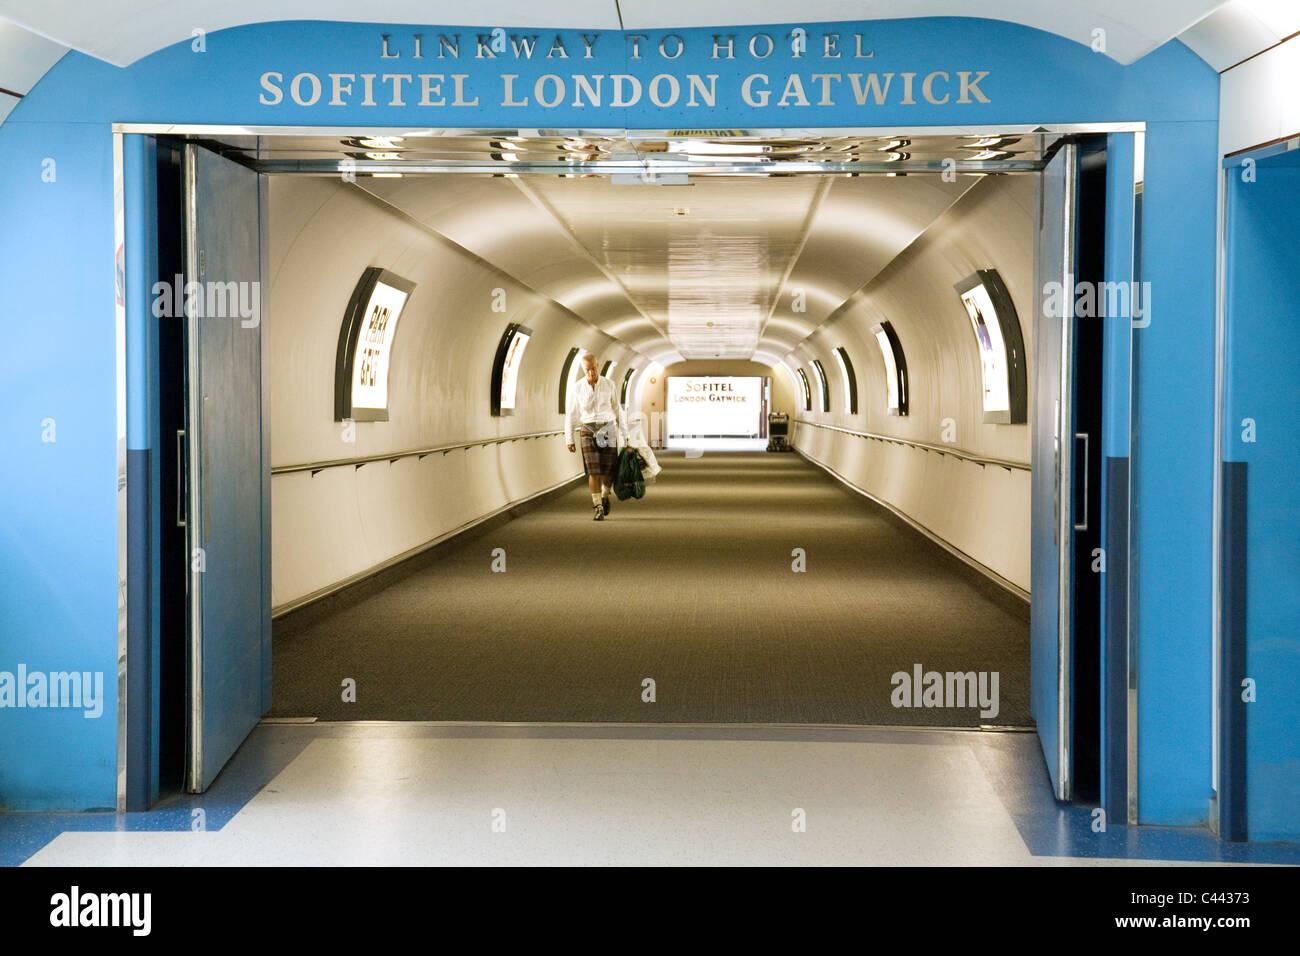 Entrance to the Sofitel Hotel, Gatwick Airport, UK - Stock Image